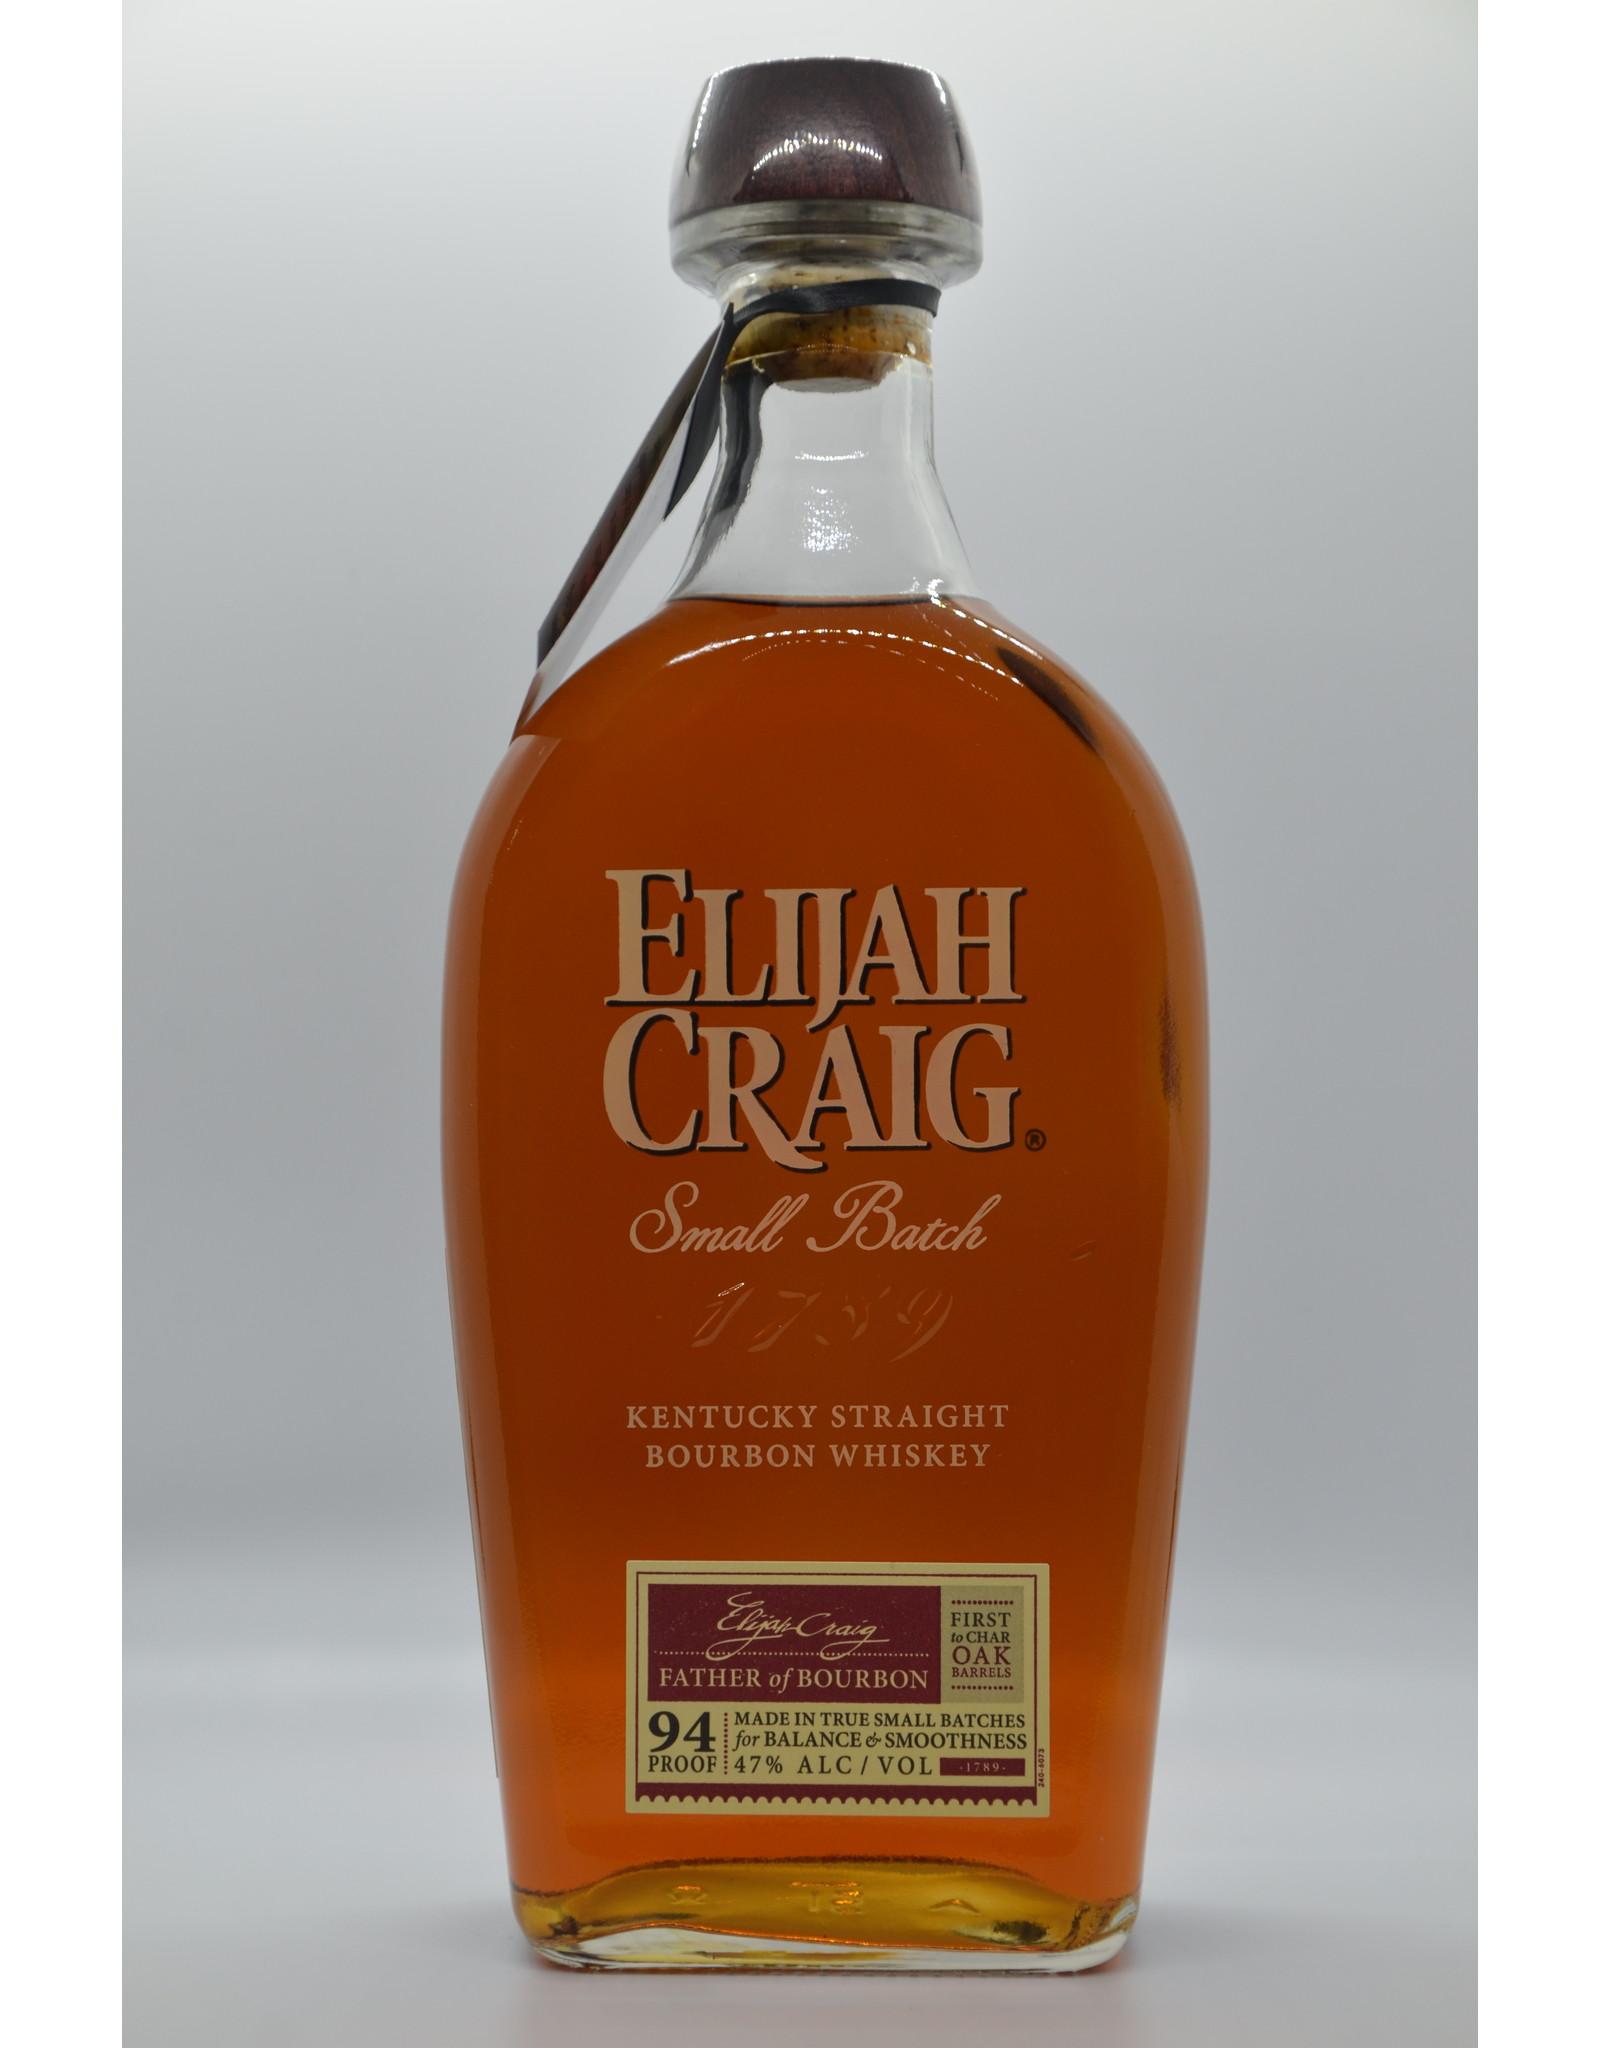 USA Elijah Craig Bourbon